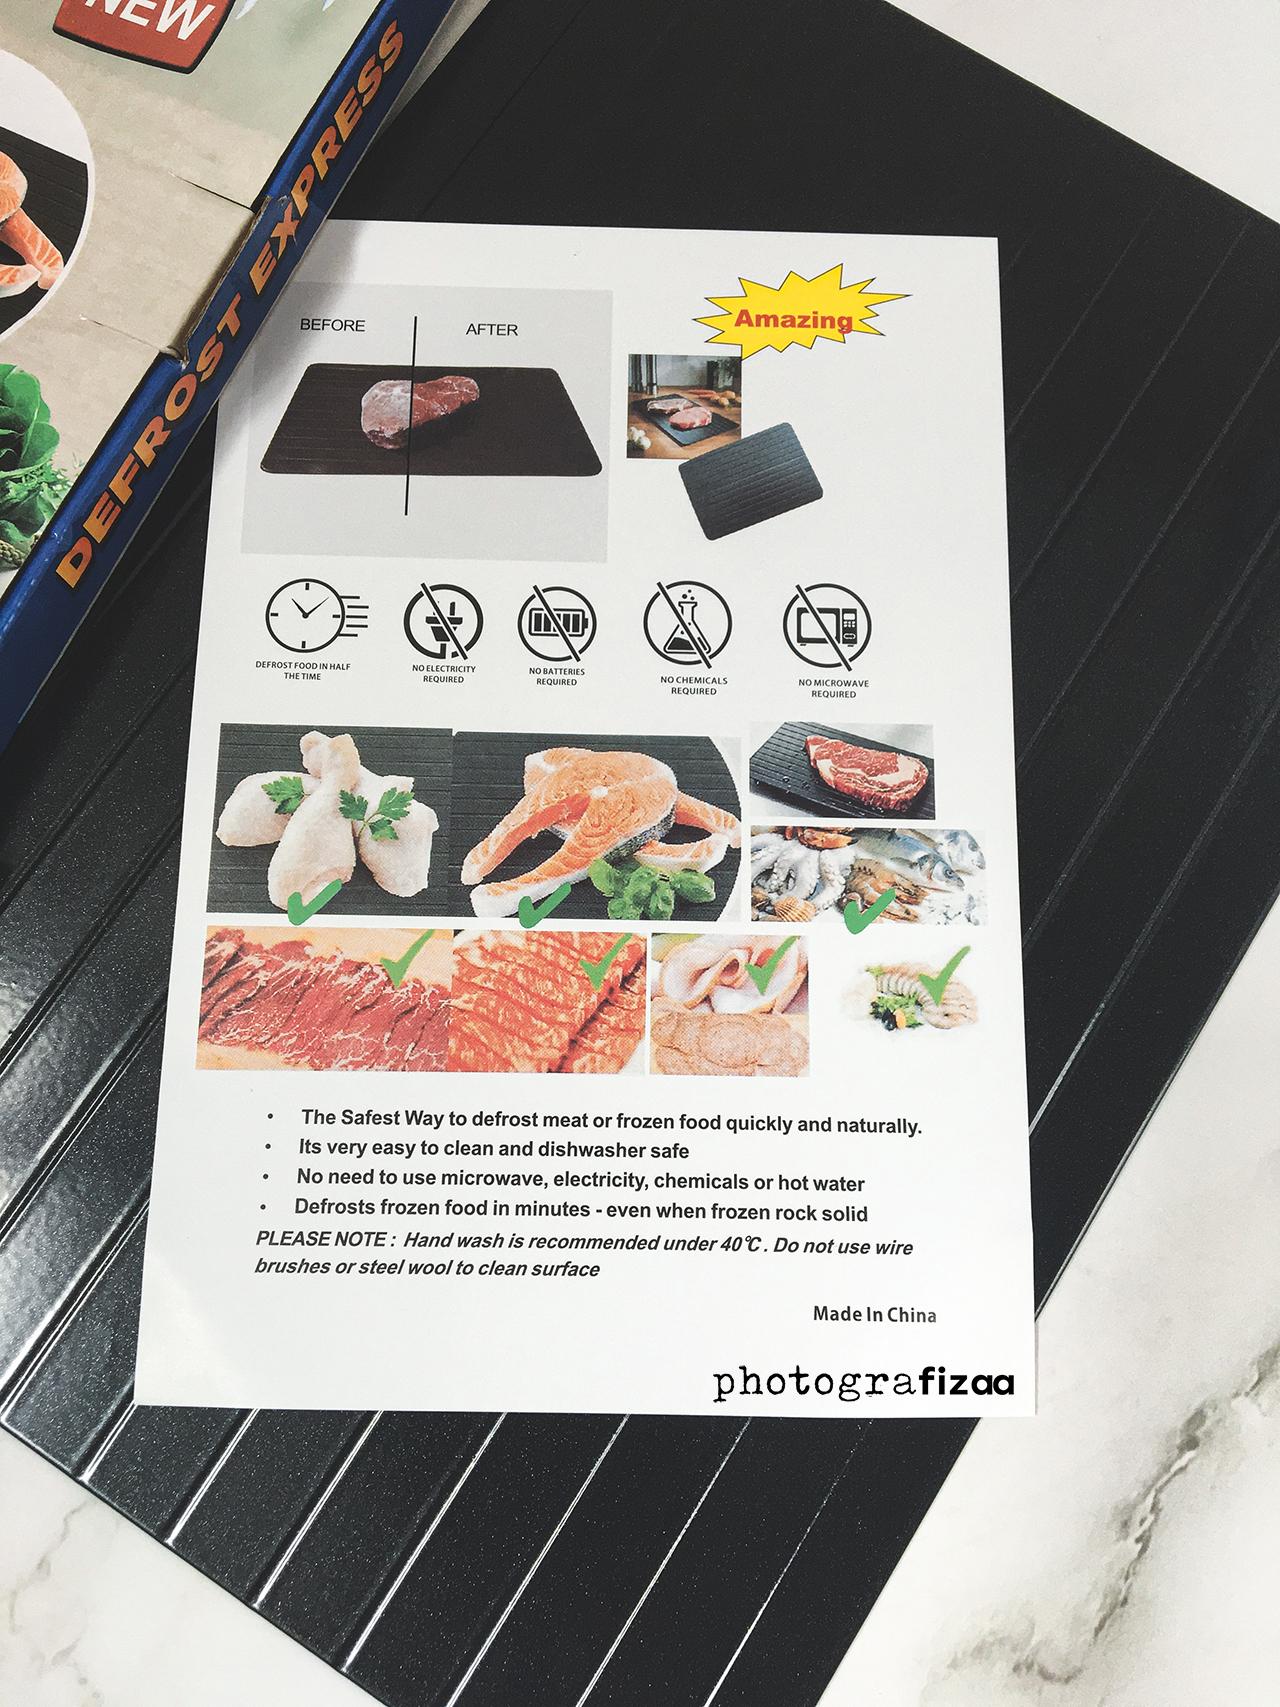 Cara Defrost Daging, Ayam Dan Ikan Cepat Dan Mudah